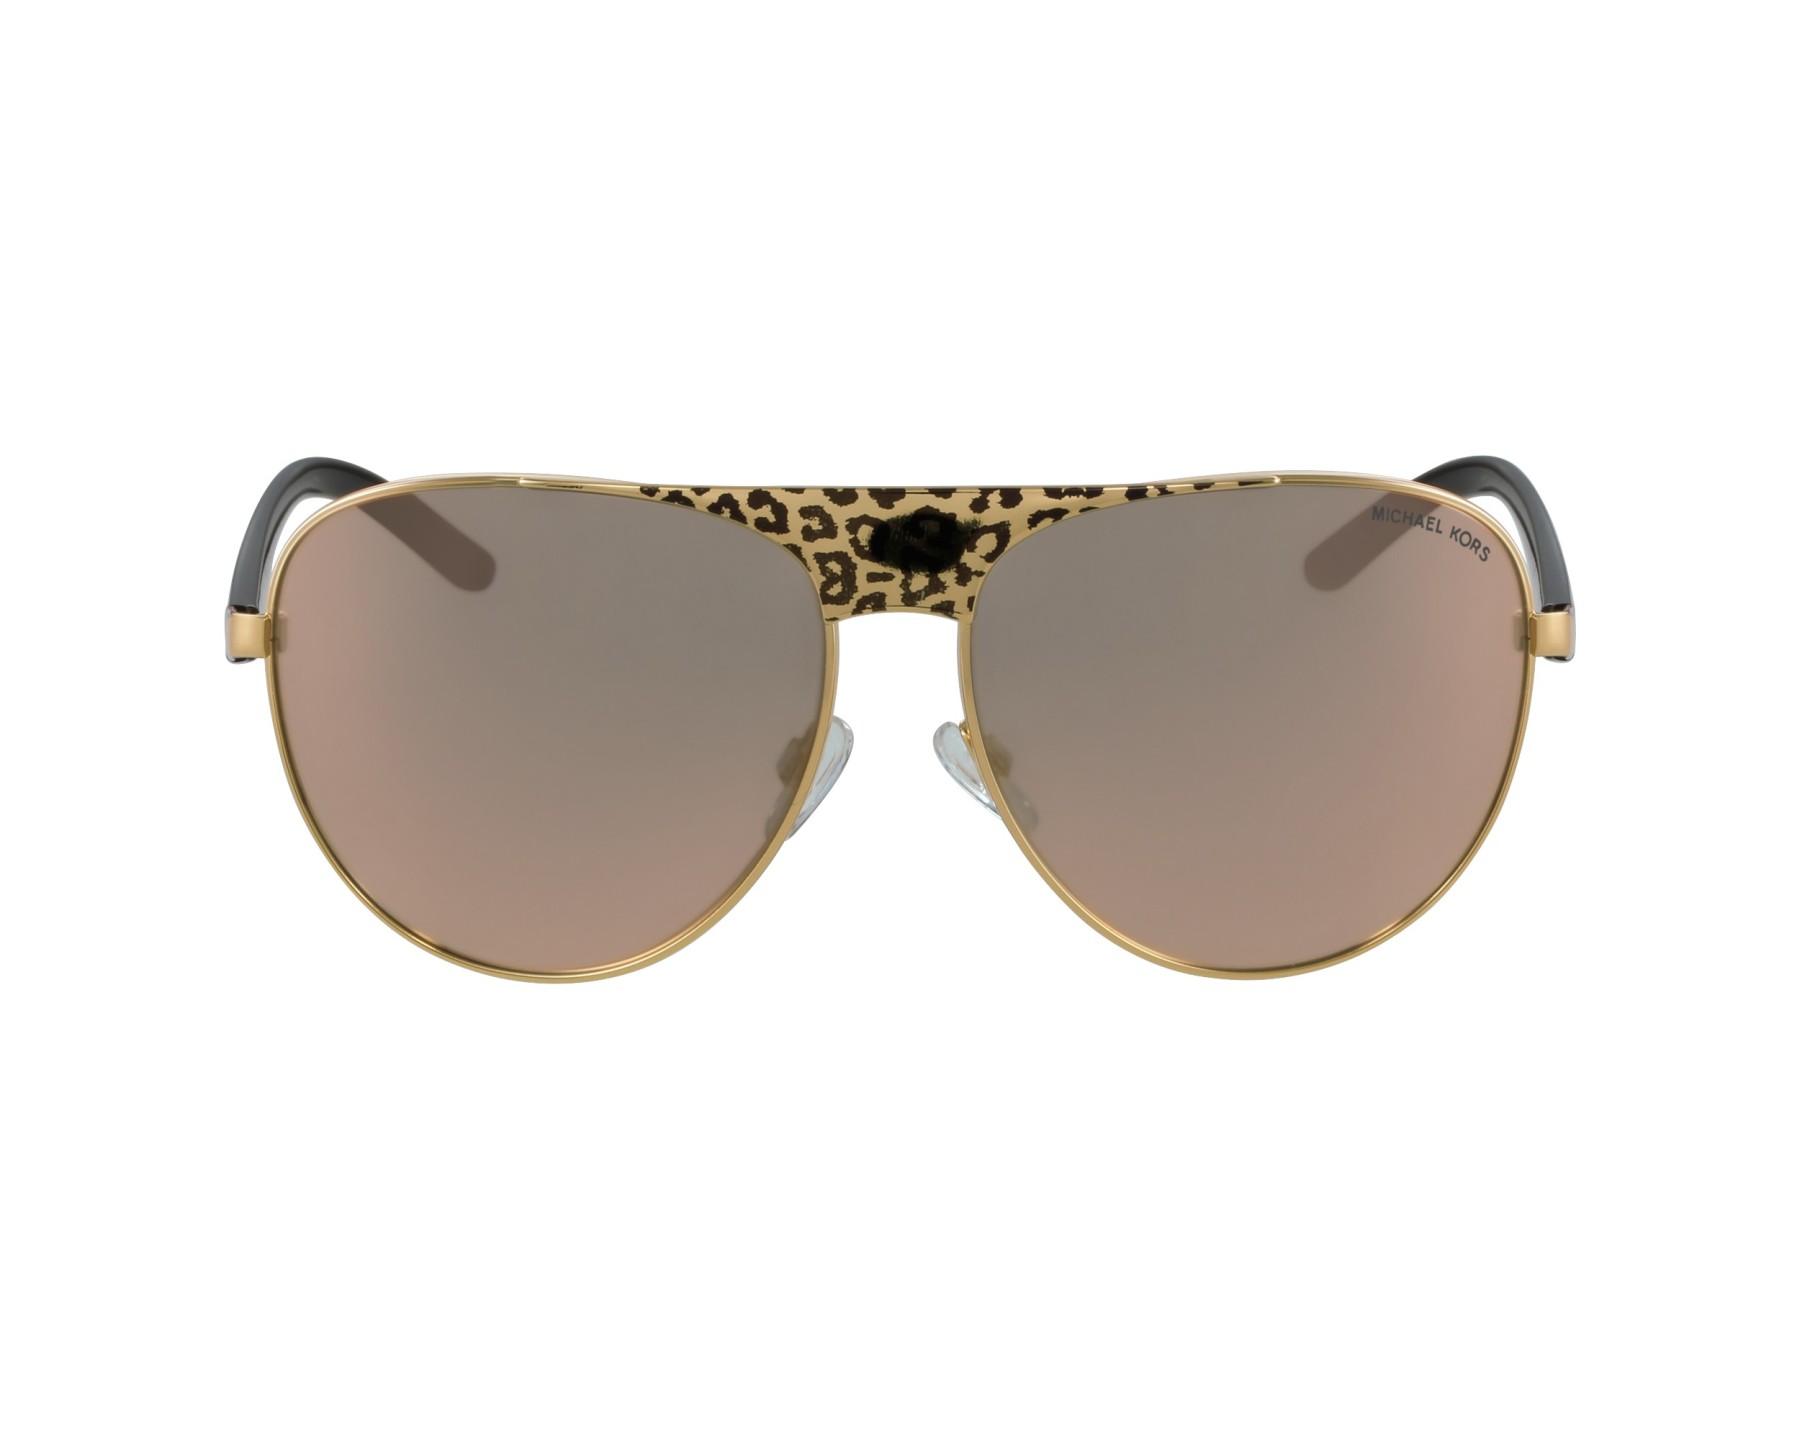 0b915456478 Sunglasses Michael Kors MK-1006 1057R5 62-14 Gold Leo profile view